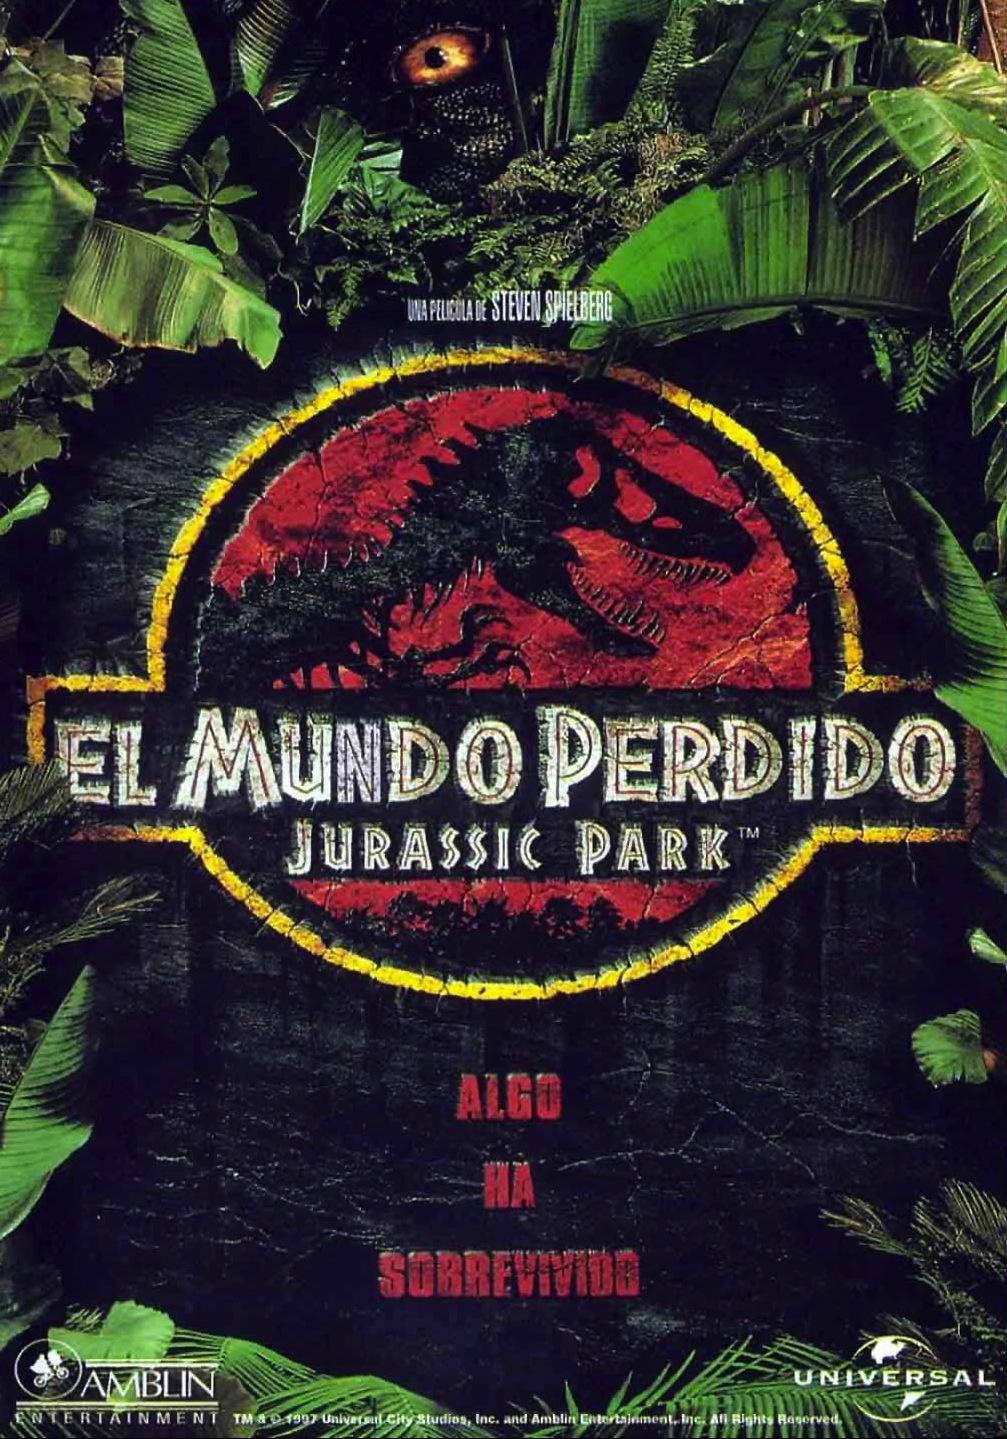 El mundo perdido Jurassic Park poster box cover